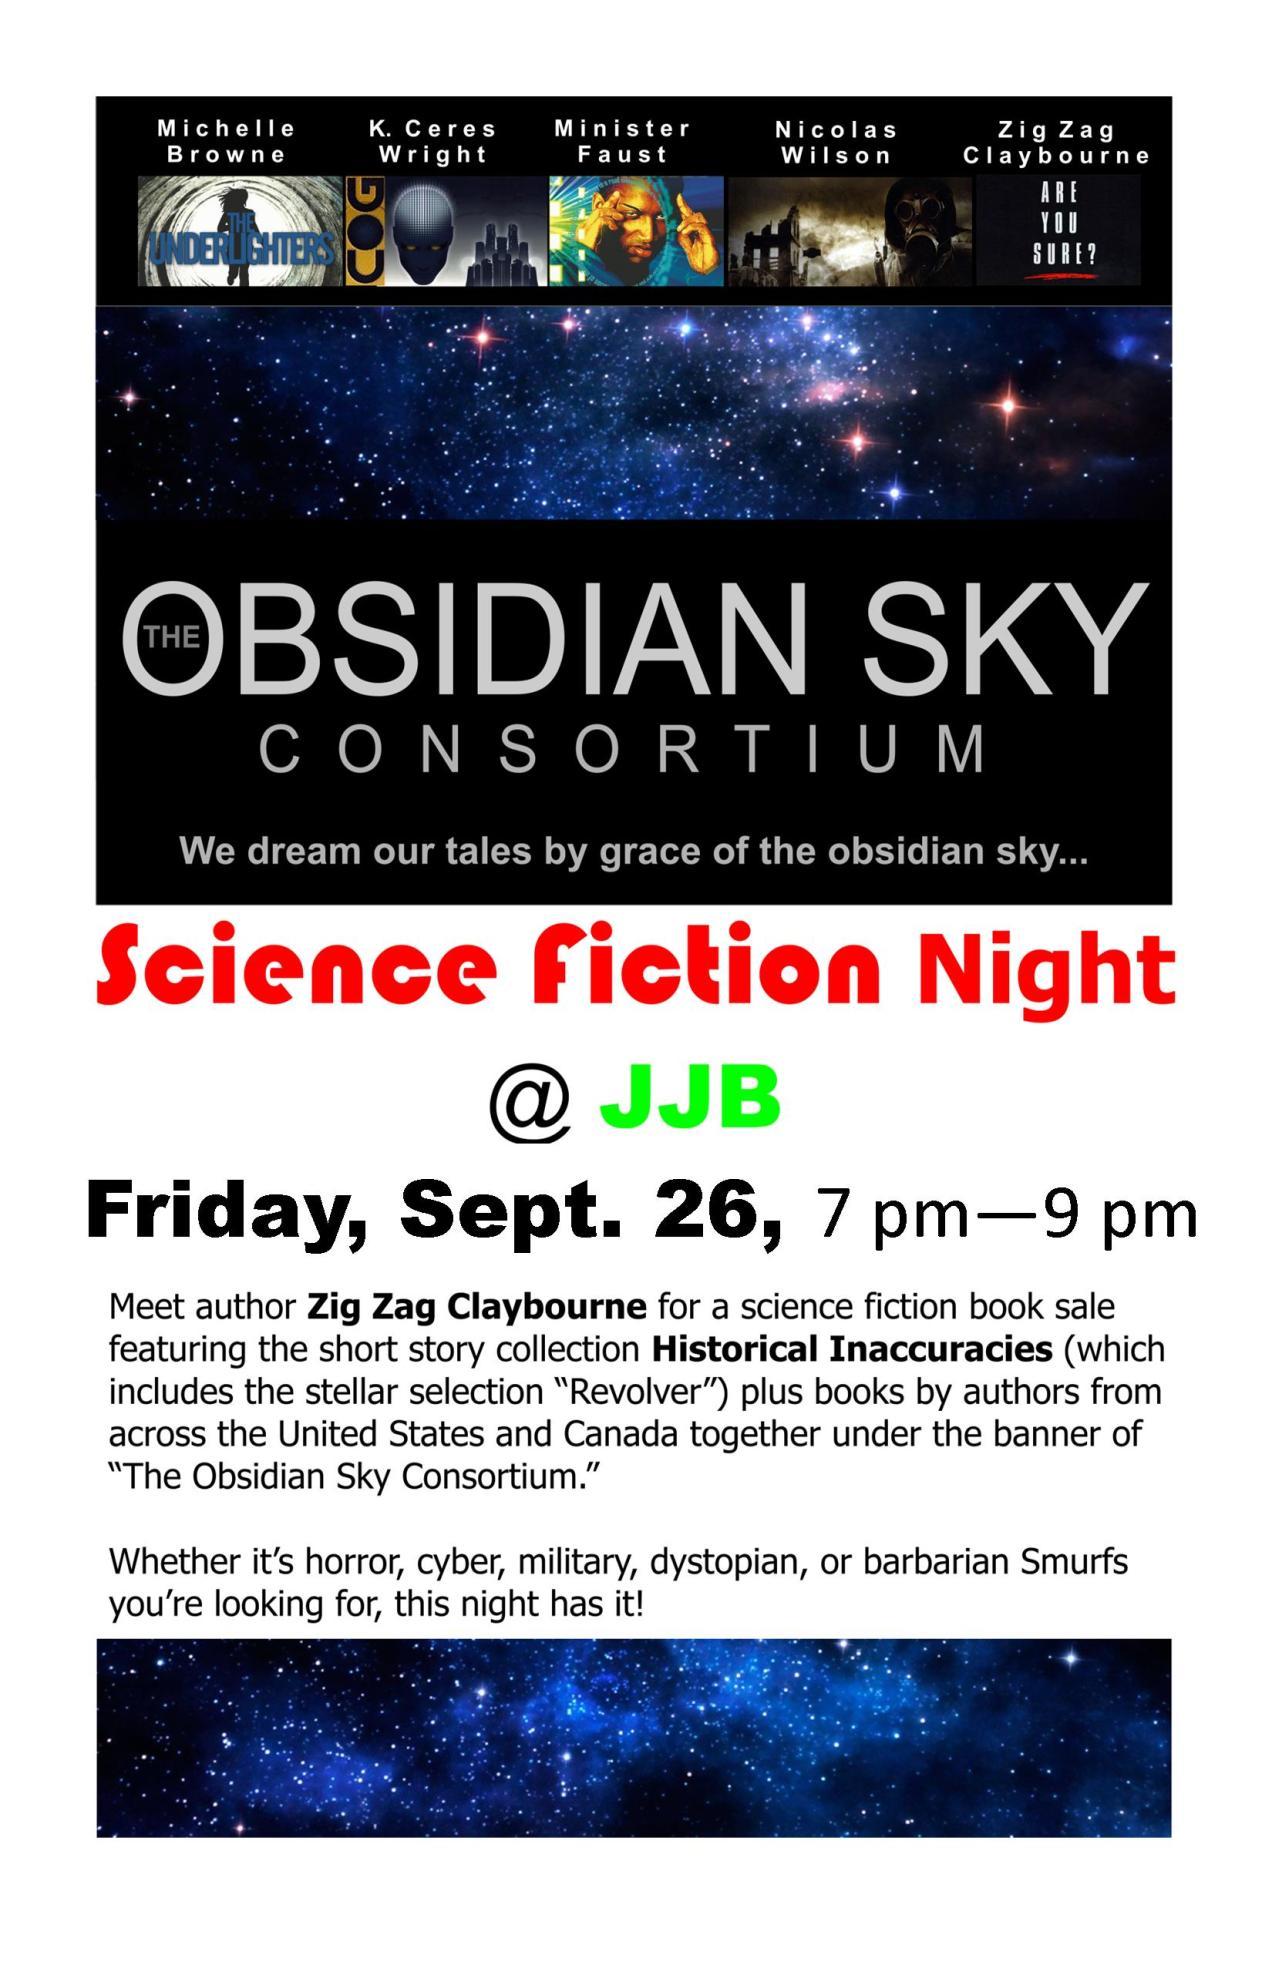 Obsidian sky at JJB